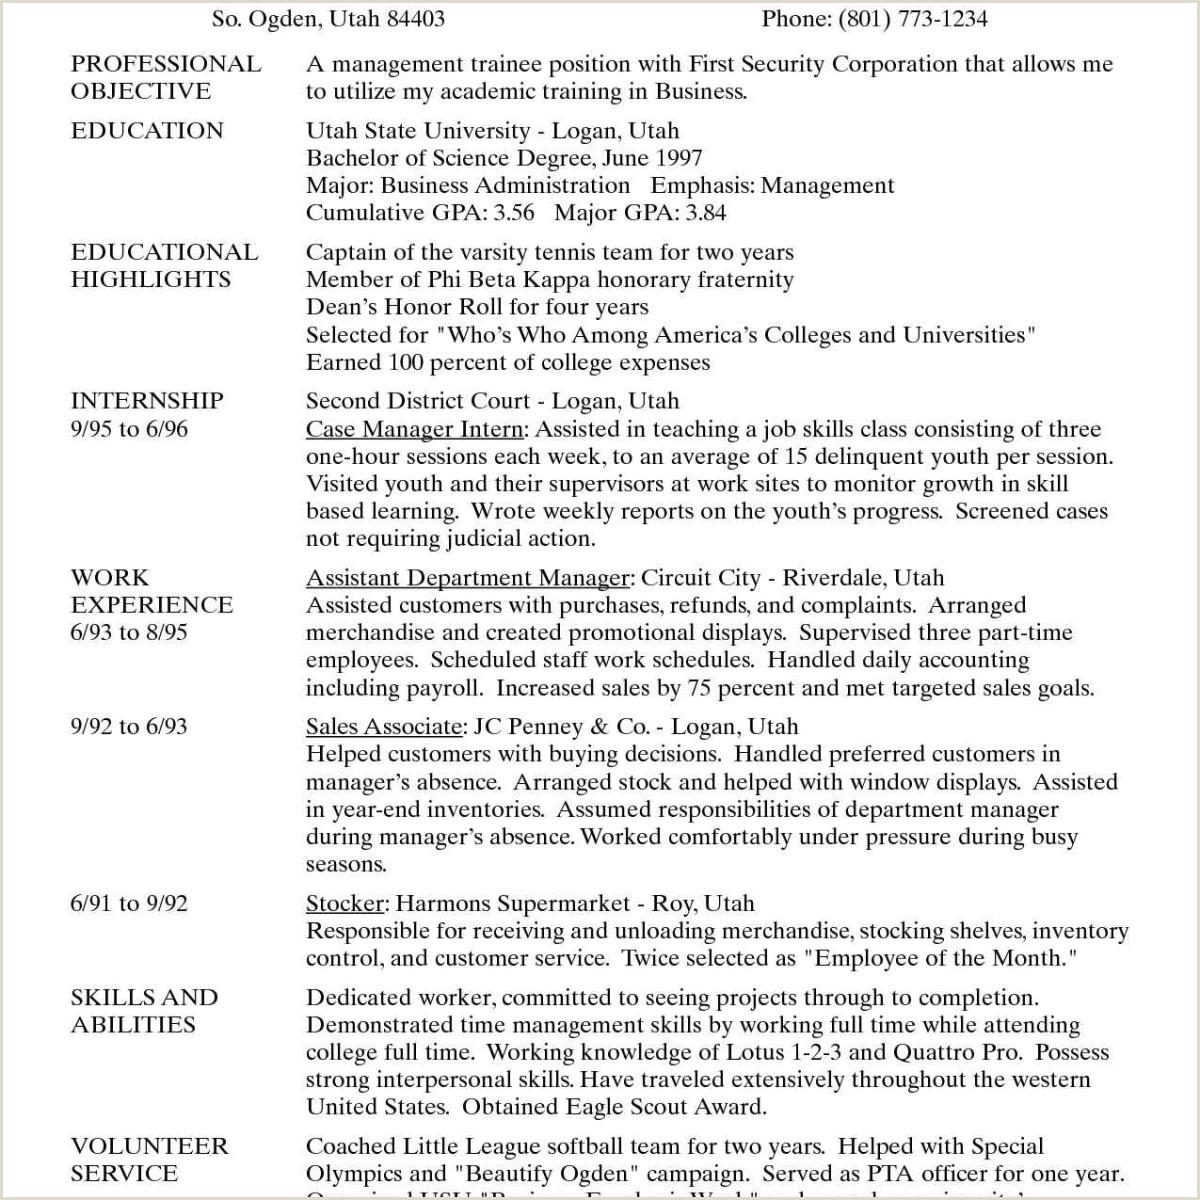 Career Goal Statement Sample 11 12 Cover Letter Career Goals Example